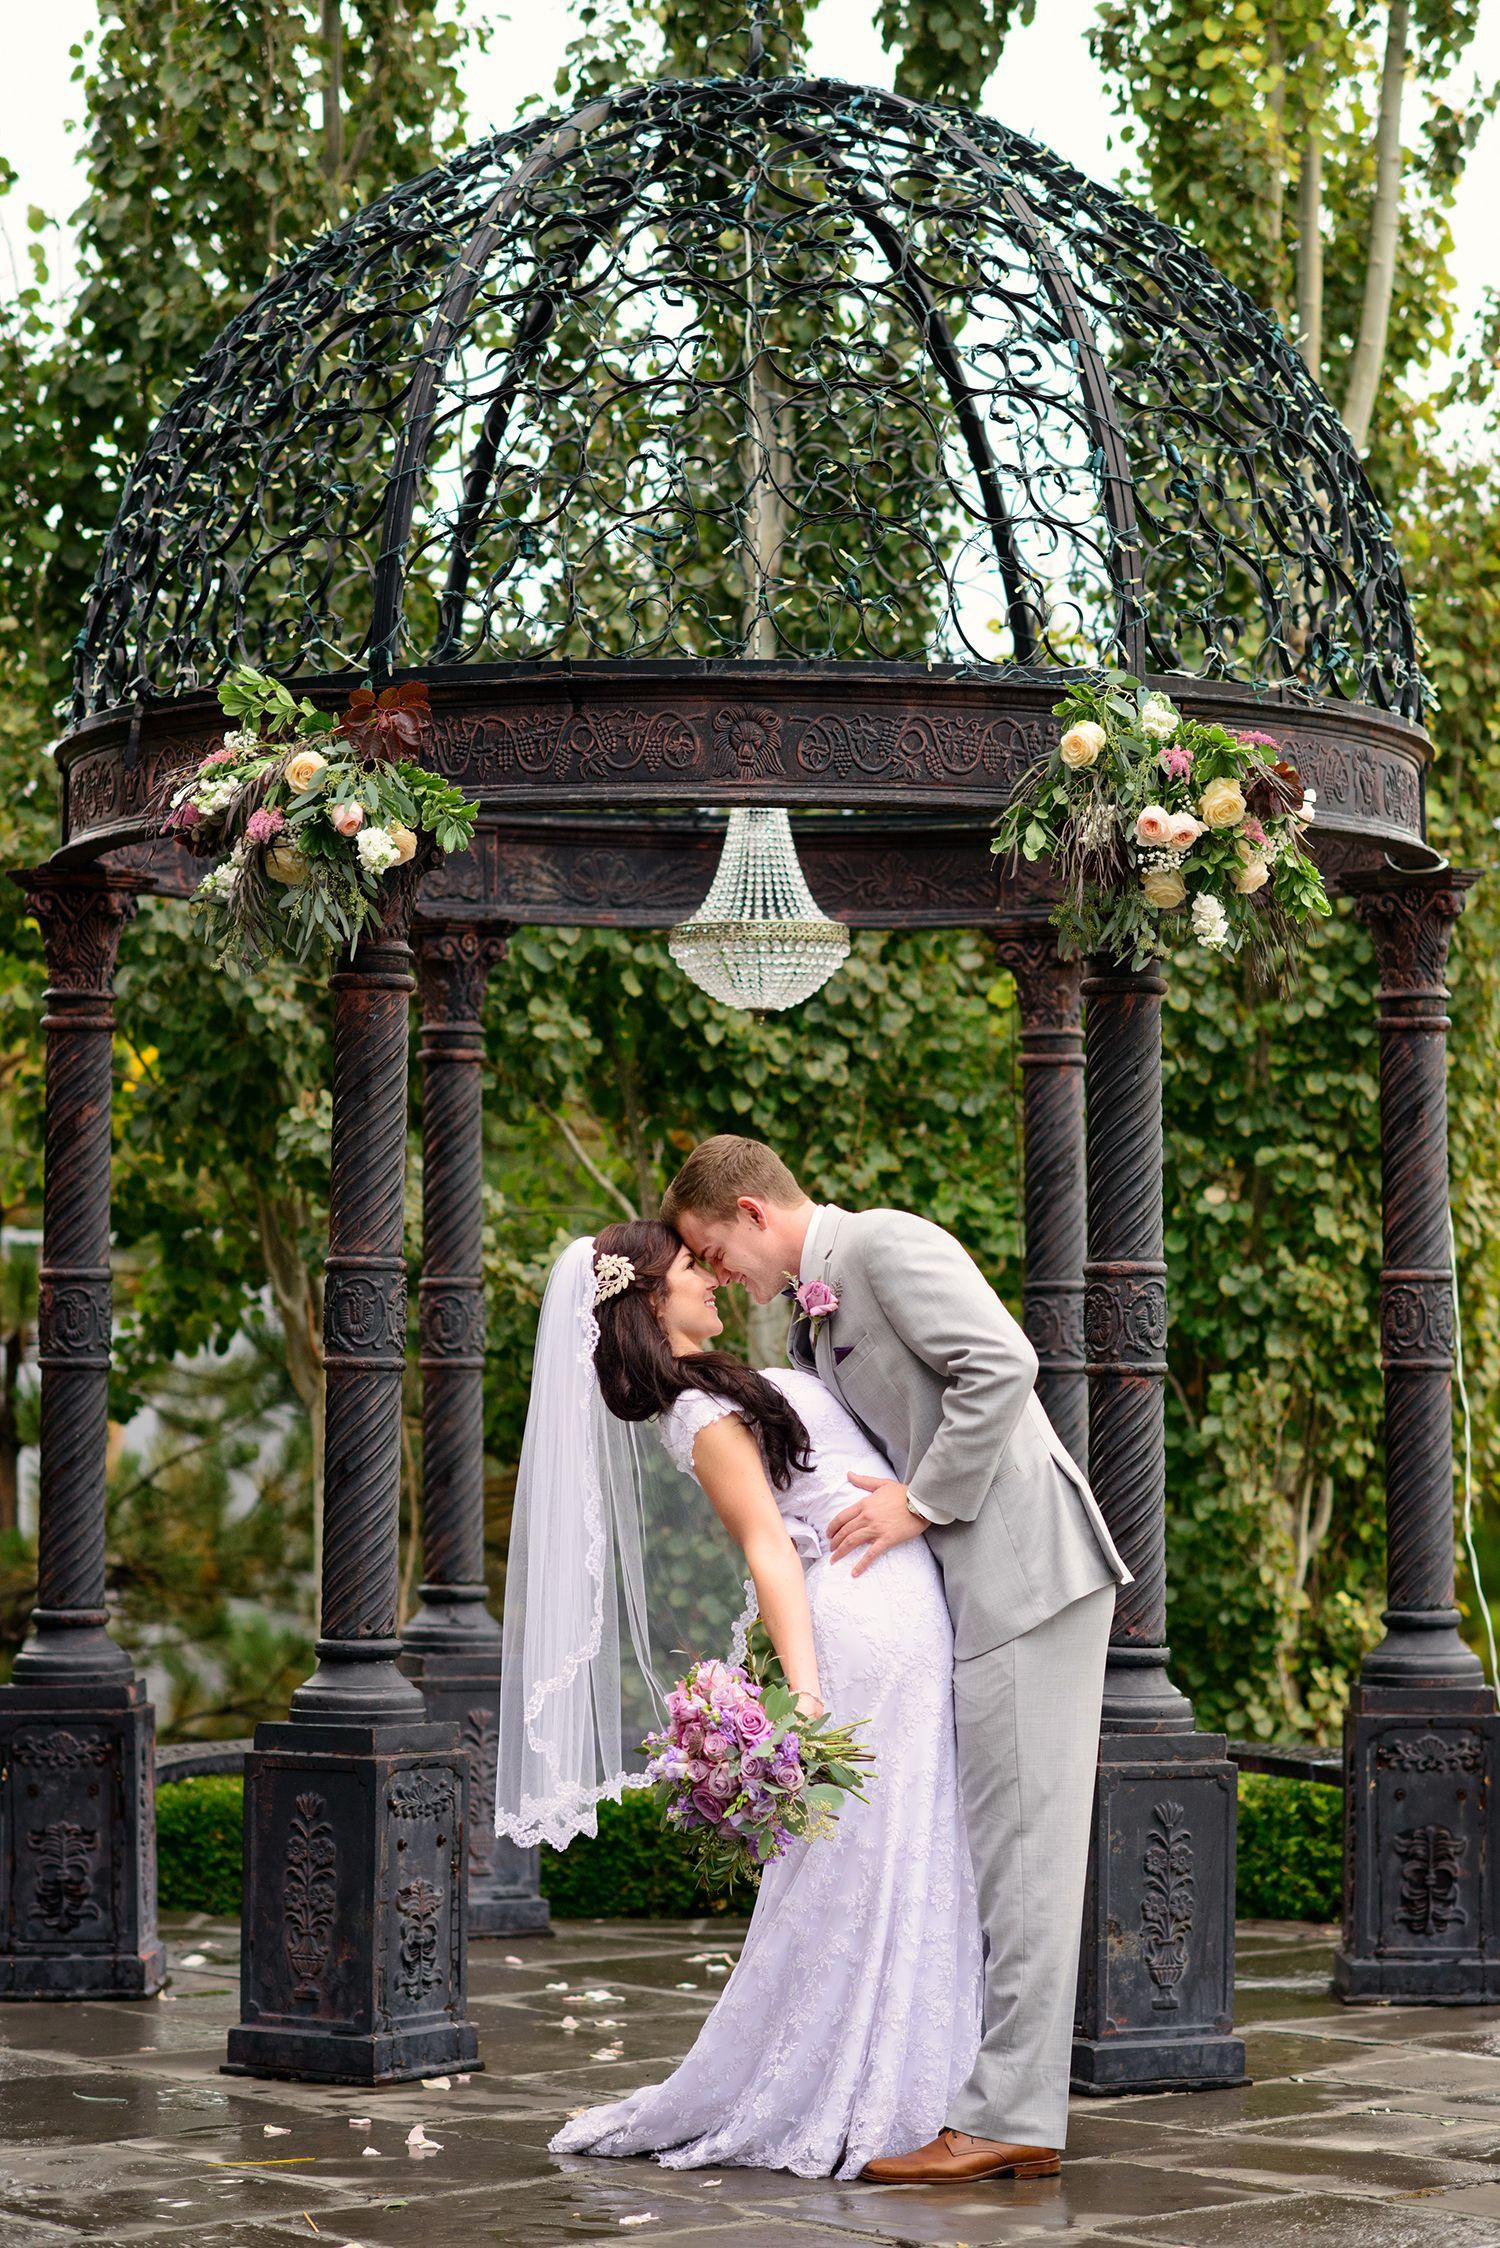 The dress garden utah - Sleepy Ridge Weddings Events Garden Room Gazebo Utah Venue Orem Bride